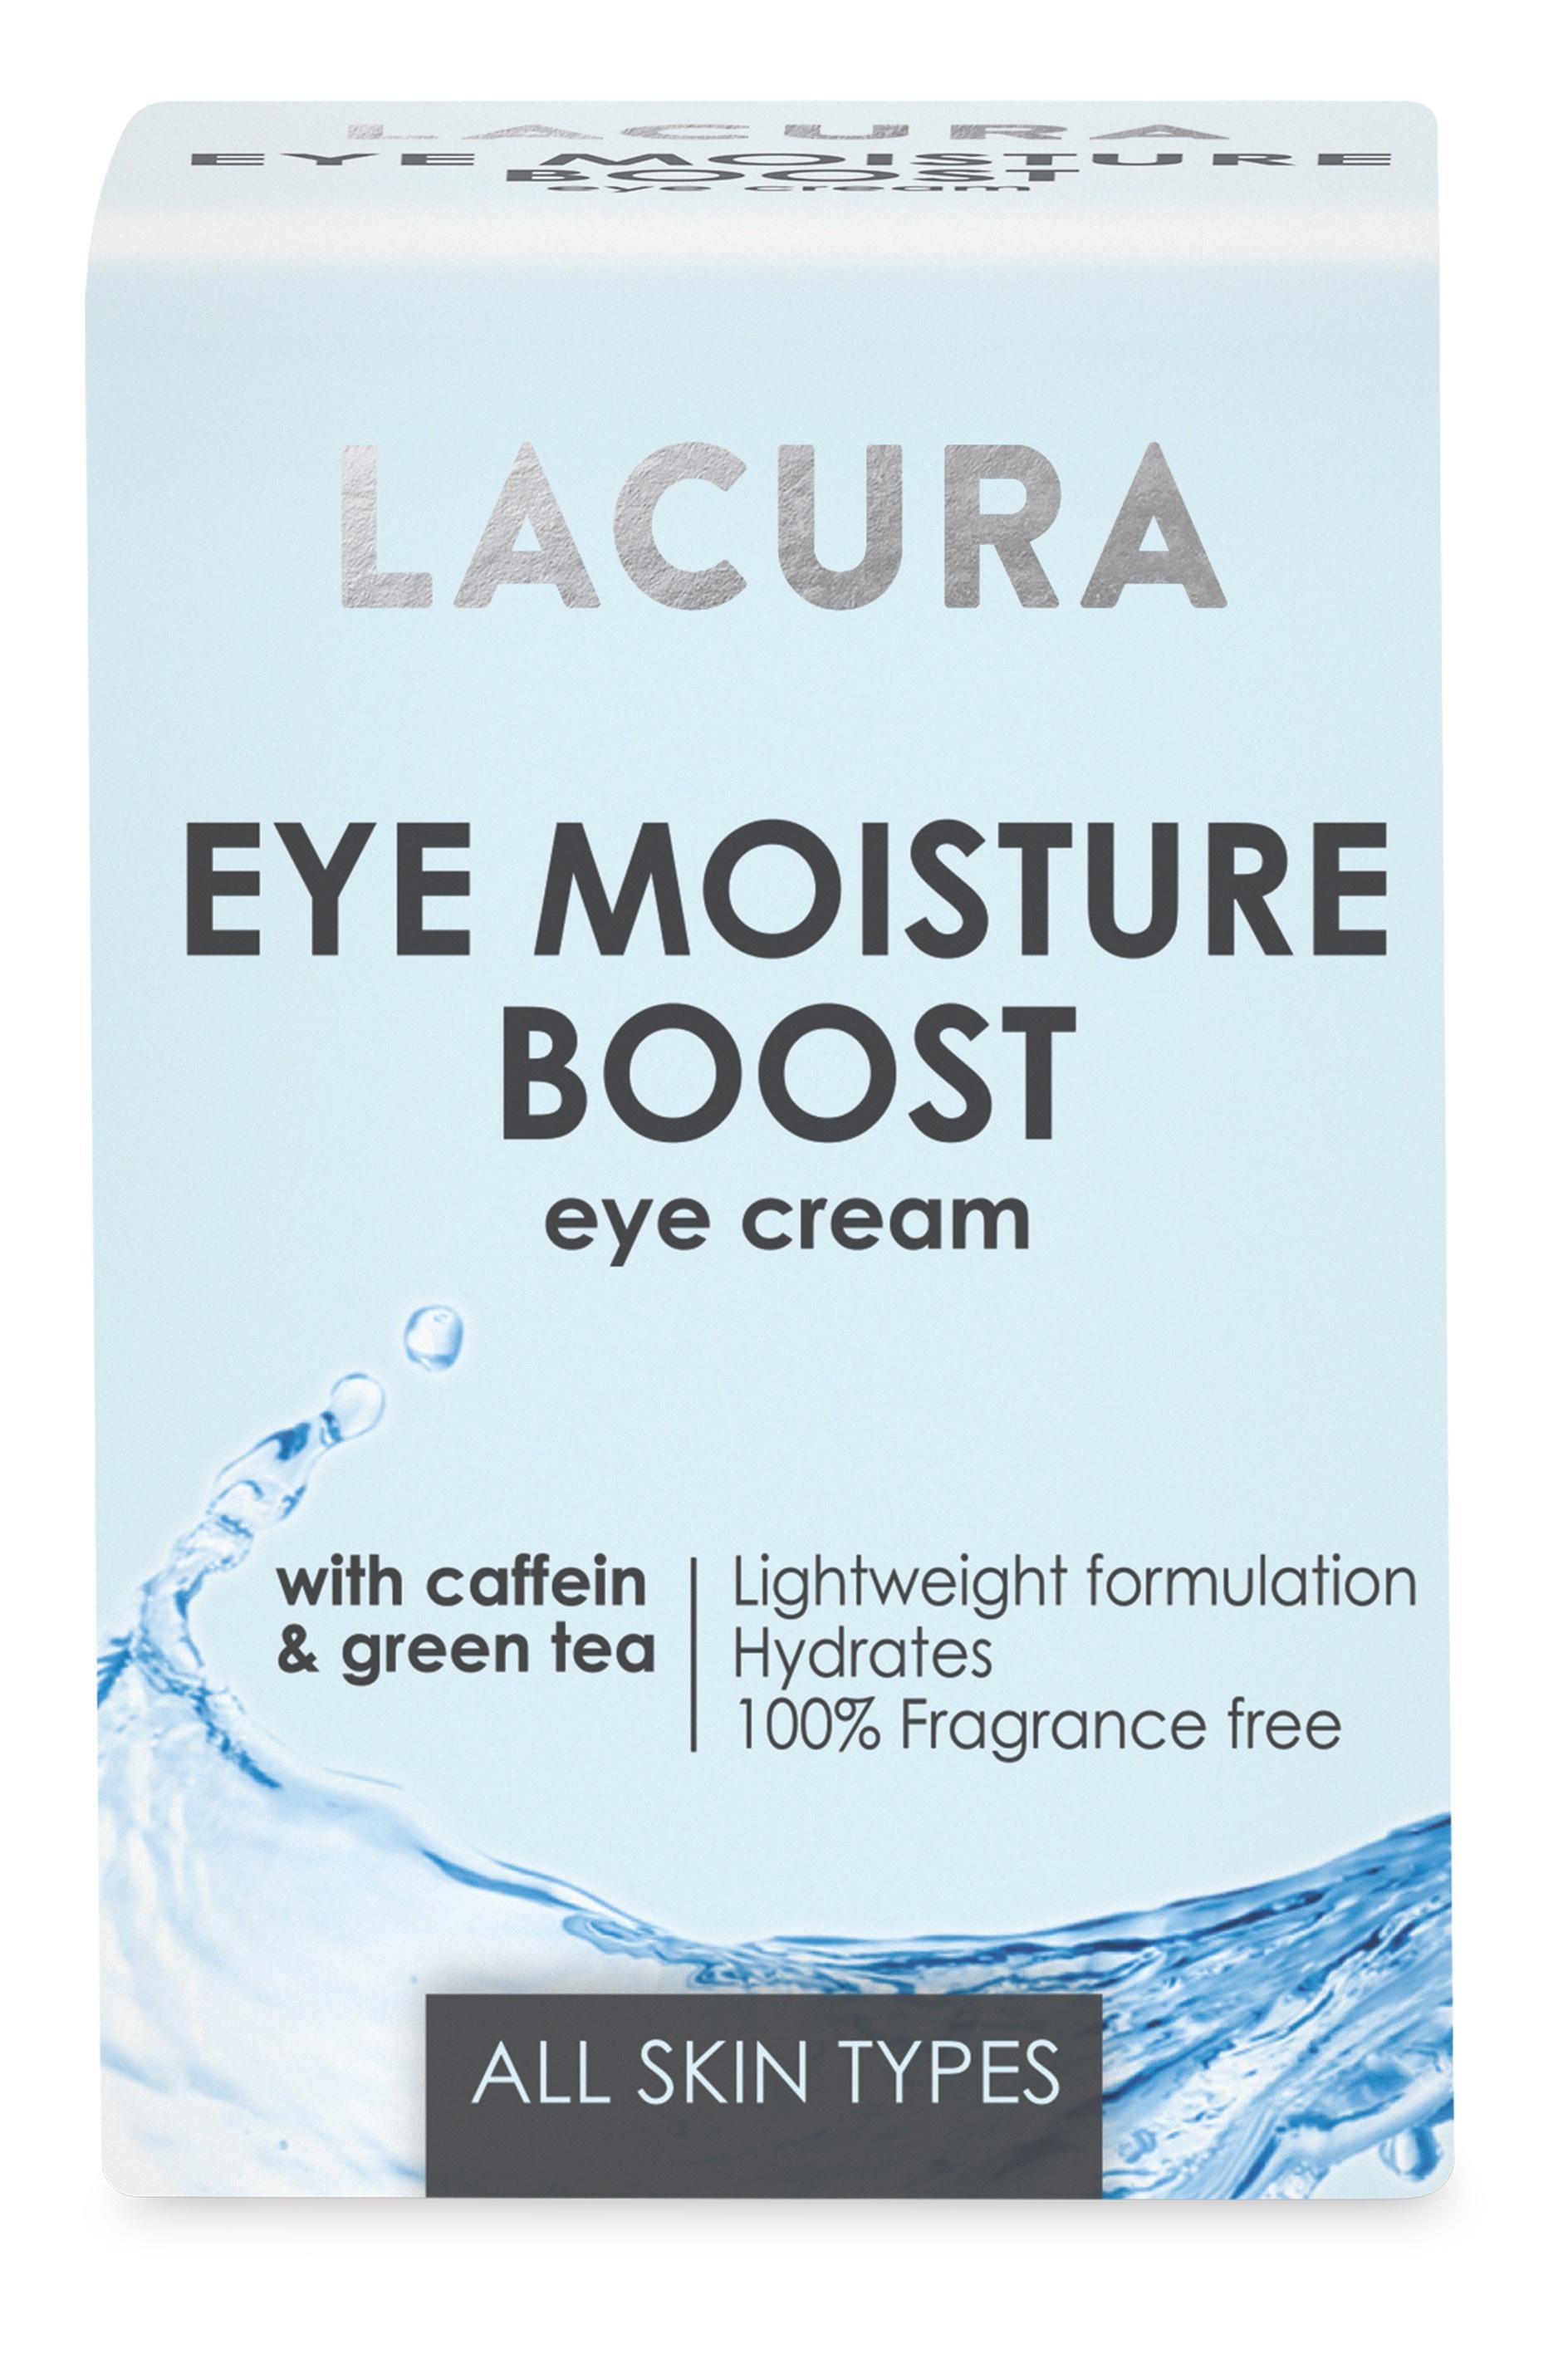 LACURA Moisture Boost Eye Cream